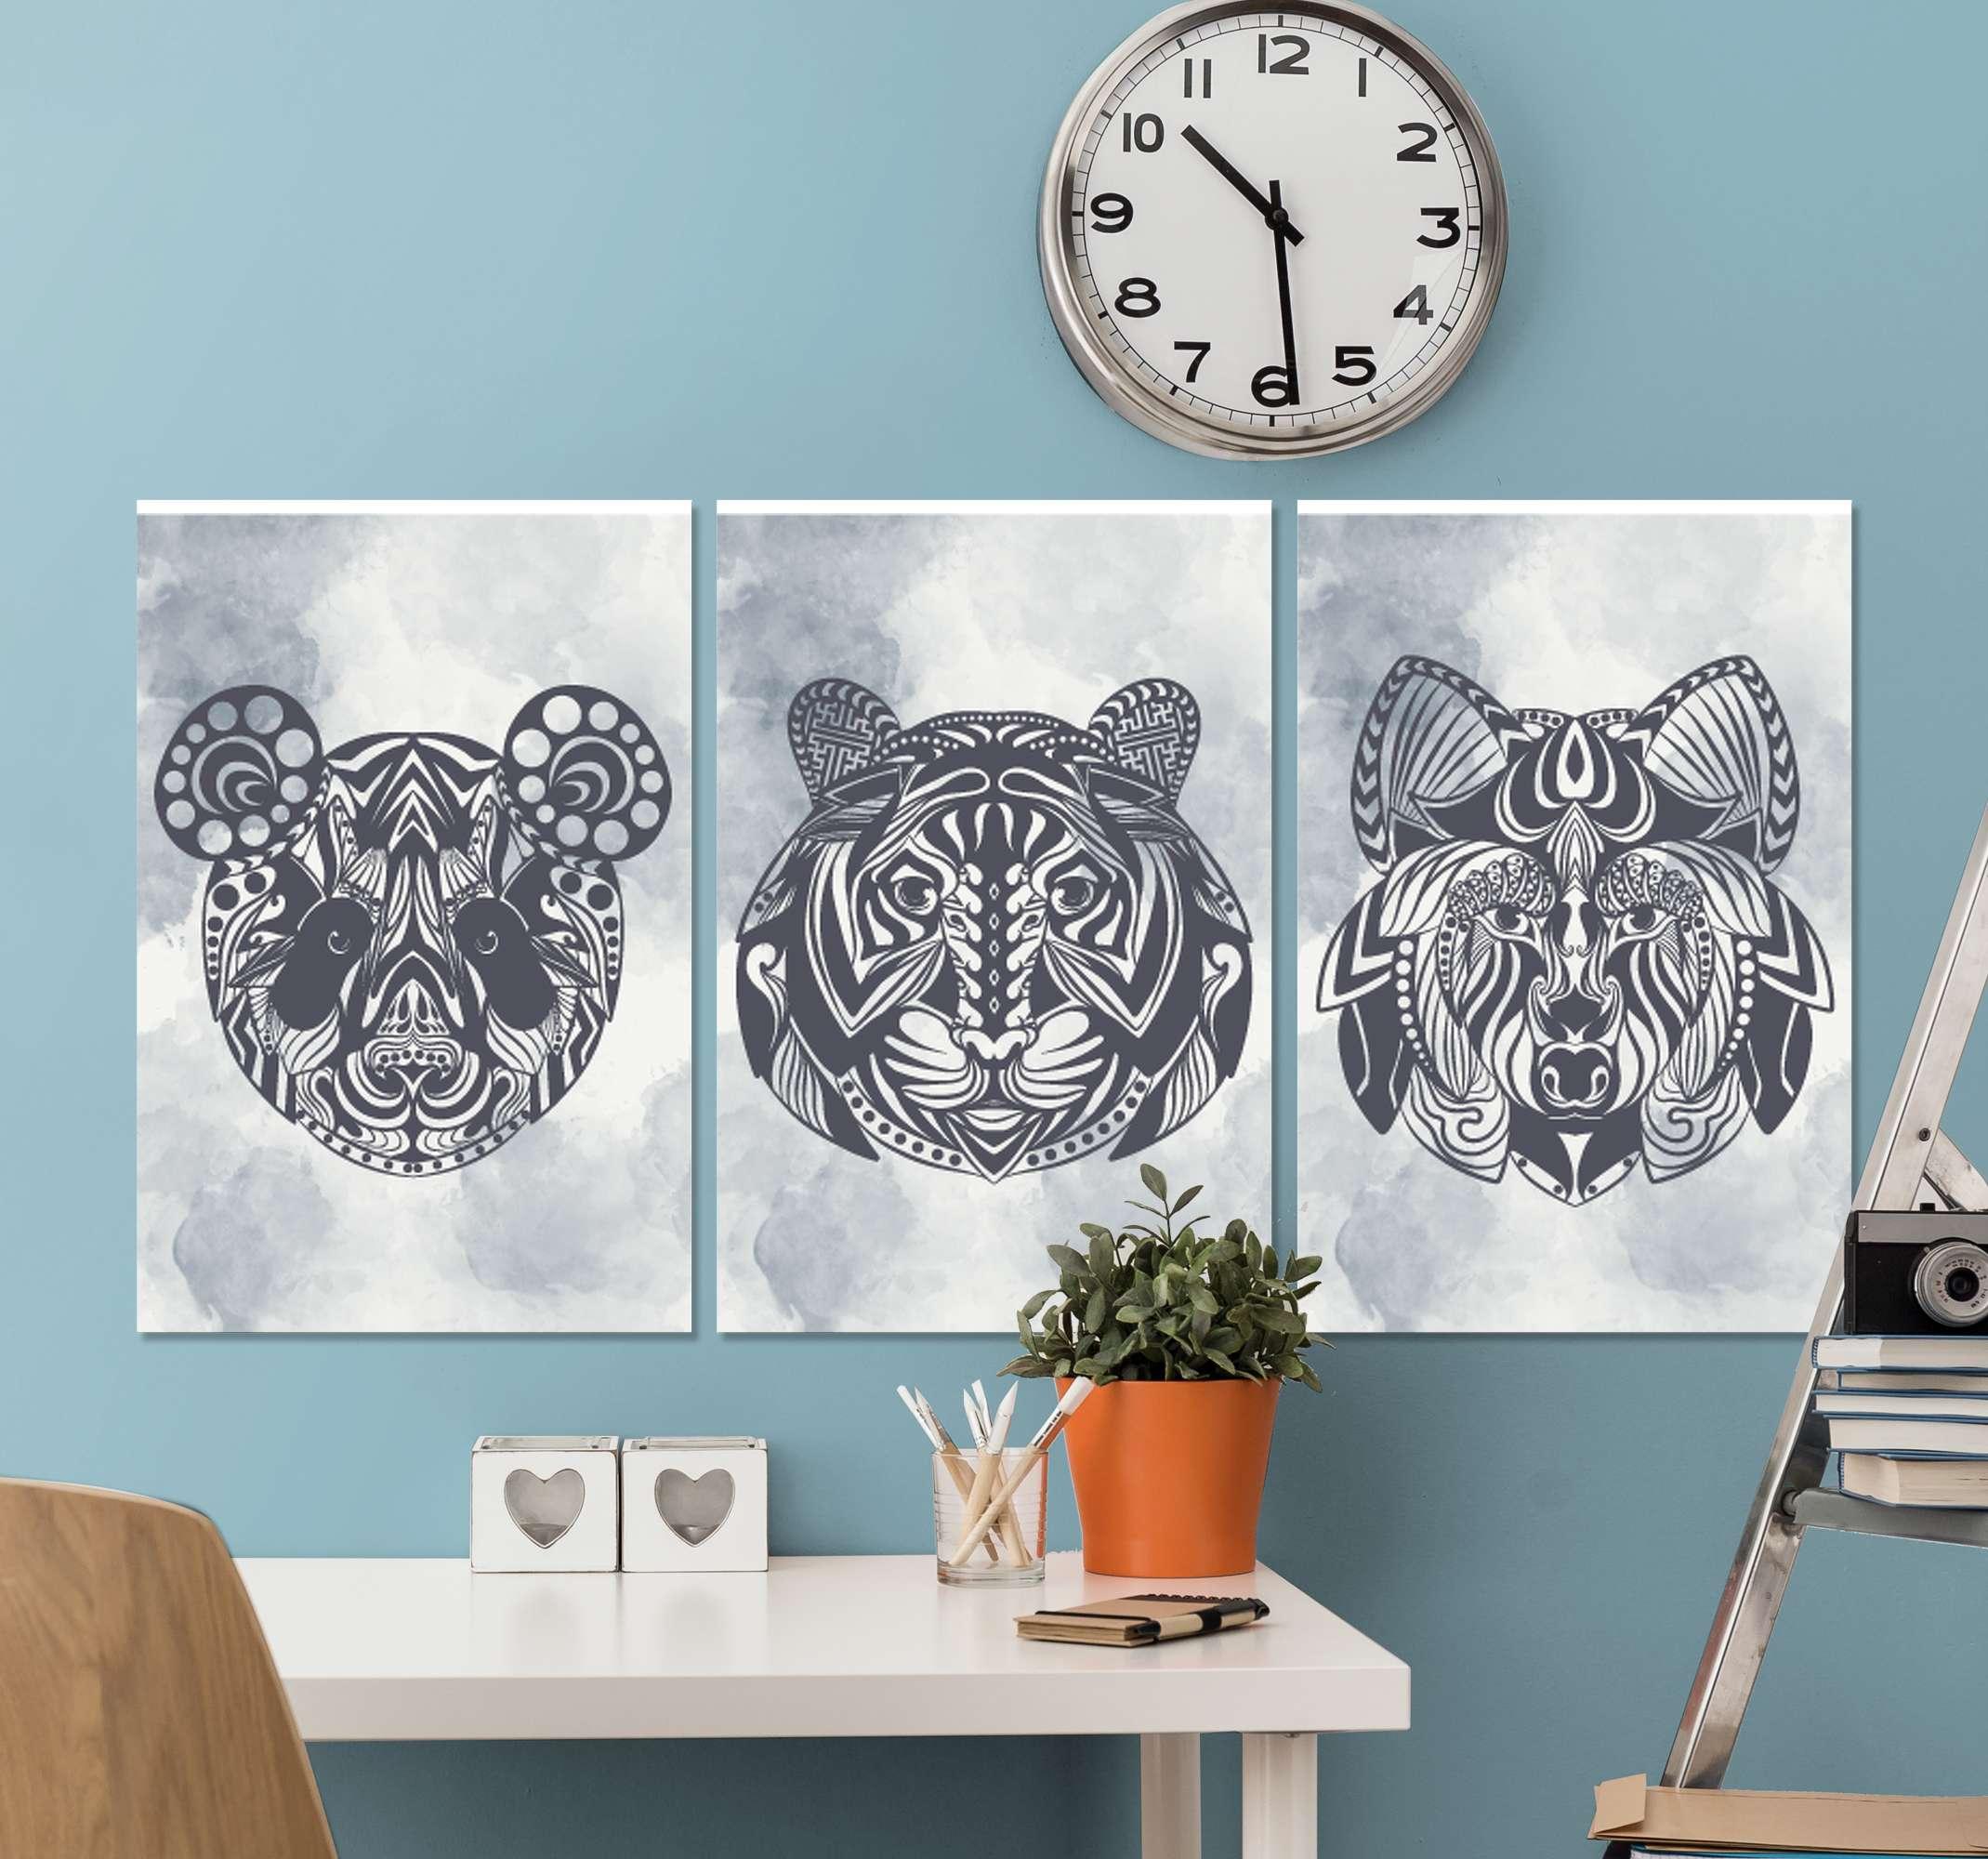 TenStickers. 动物脸曼陀罗打印墙艺术. 曼陀罗帆布印花,以3种不同的帆布印花为特色,所有印花都带有曼陀罗图案的独特动物面孔。注册10%的折扣。